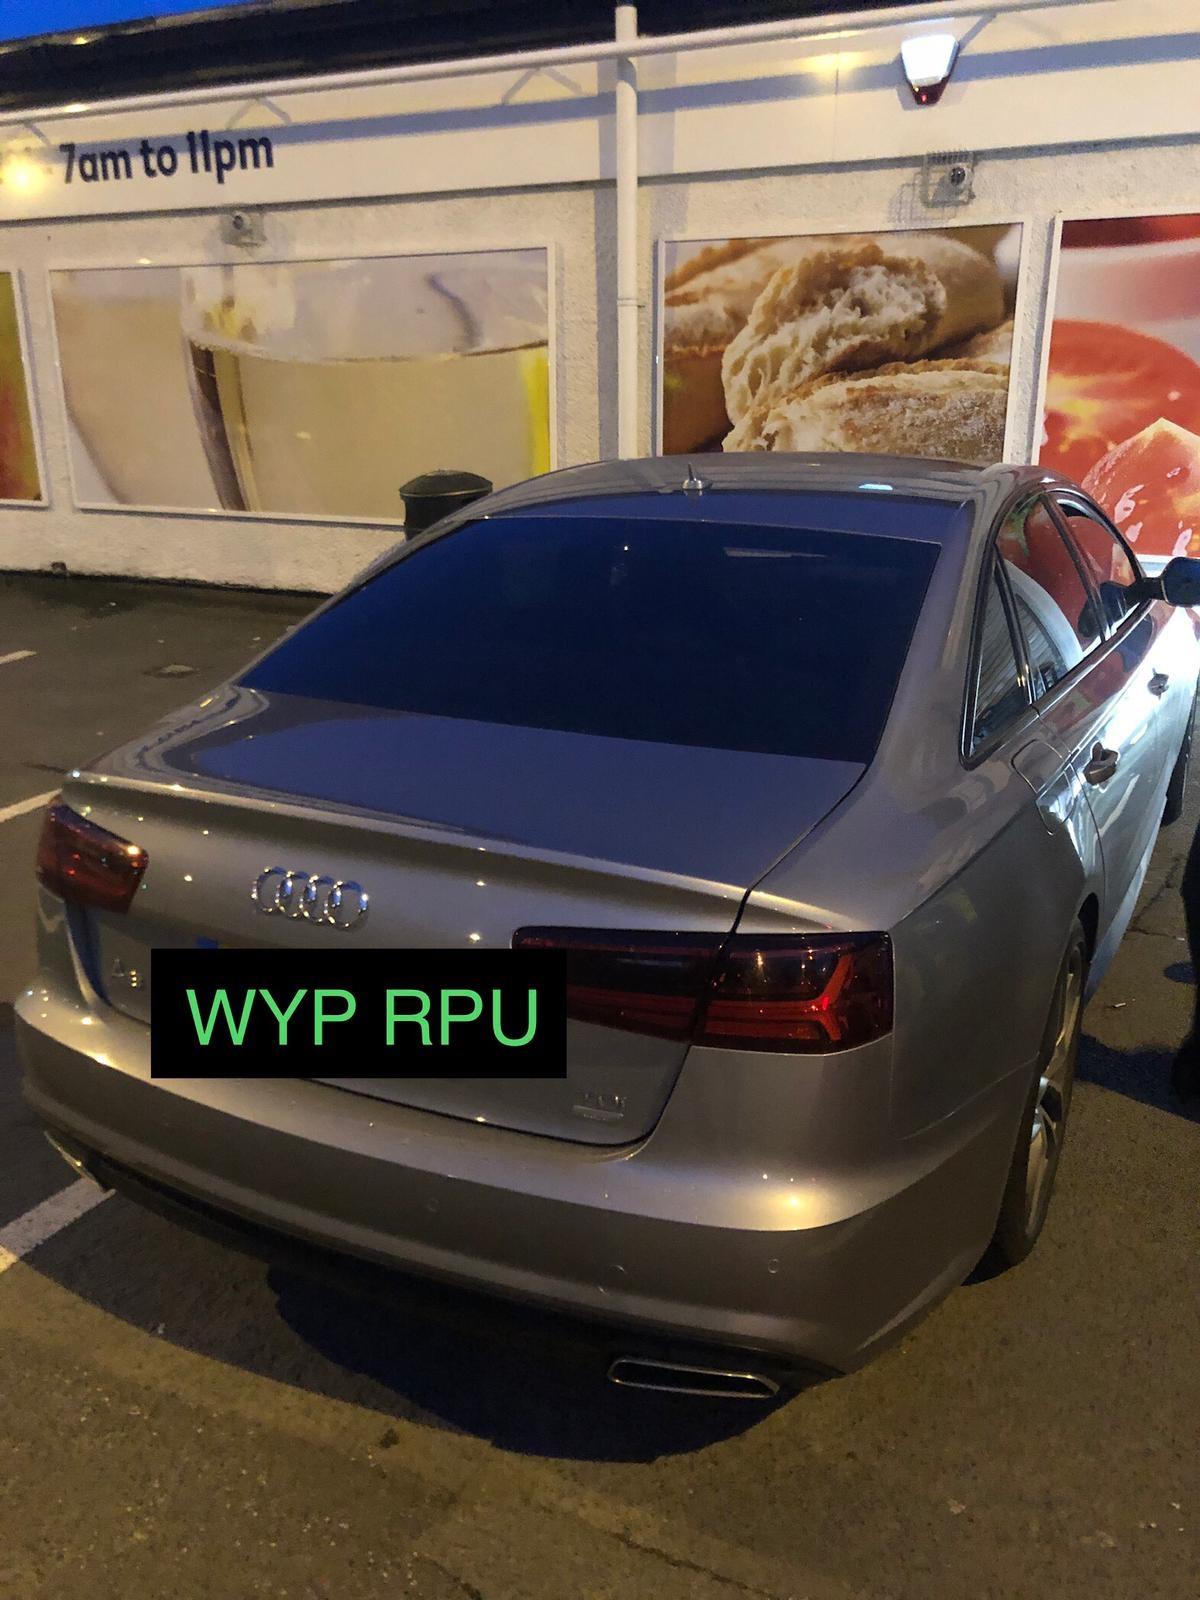 Stolen Audi stopped in Leeds Road, Bradford